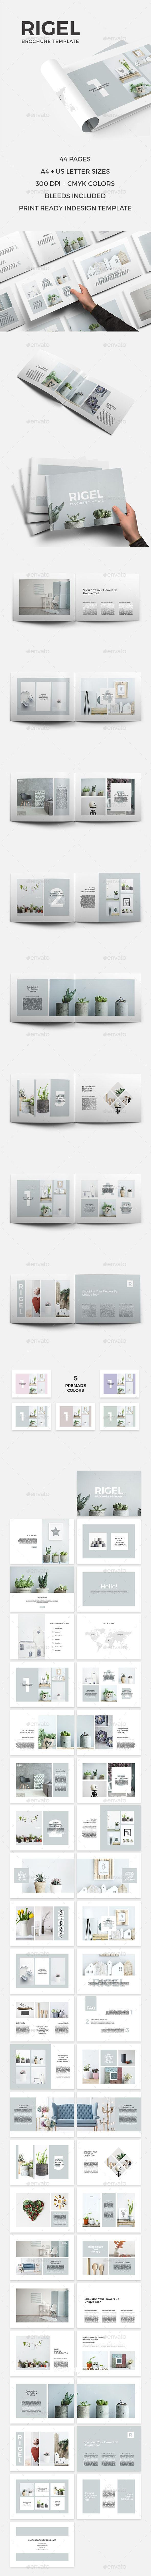 Rigel Brochure Template - Brochures Print Templates